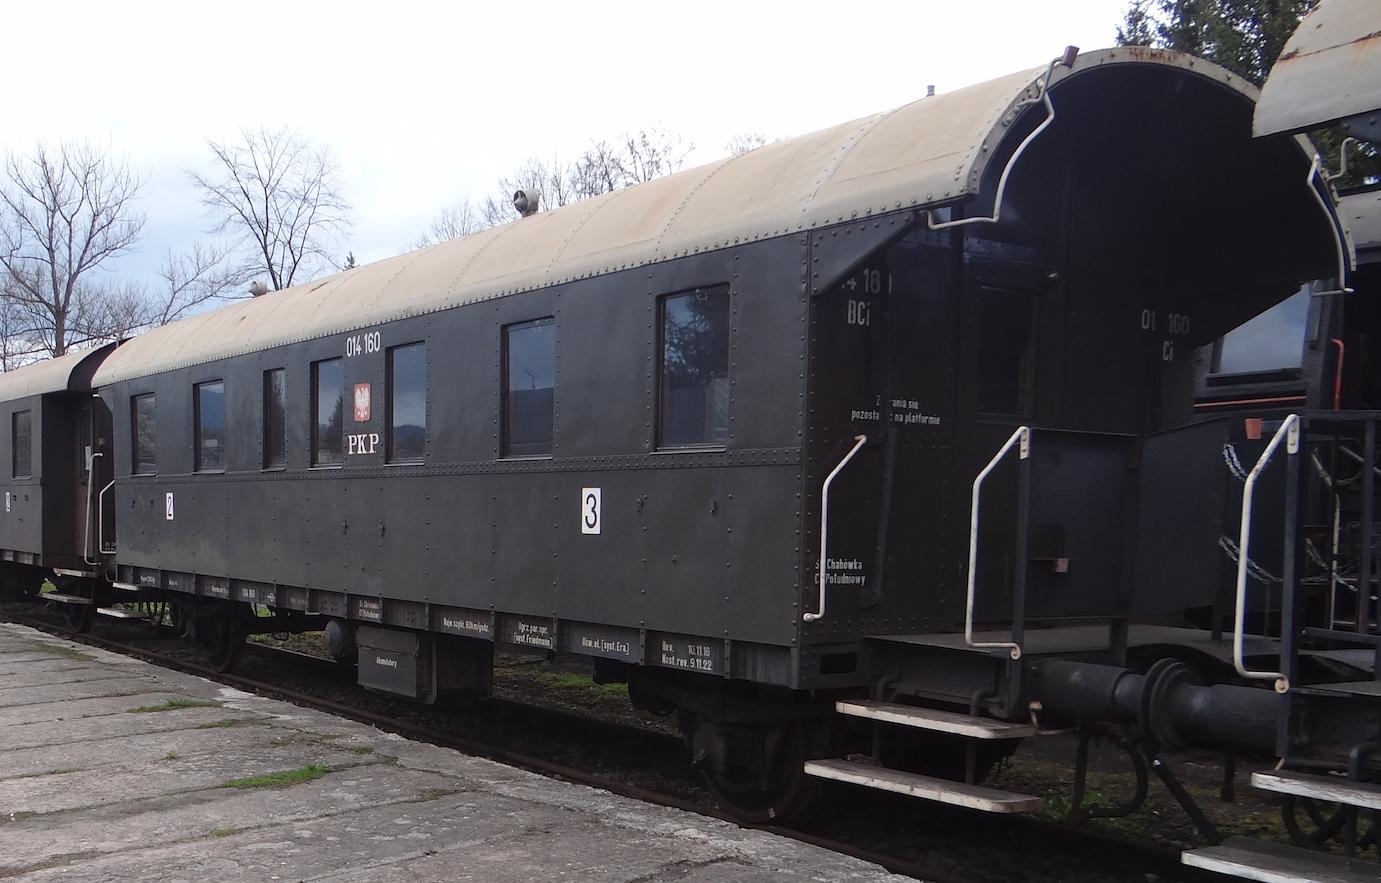 Wagon BCi nr 014160 klasy 2/3. 2021 rok. Zdjęcie Karol Placha Hetman